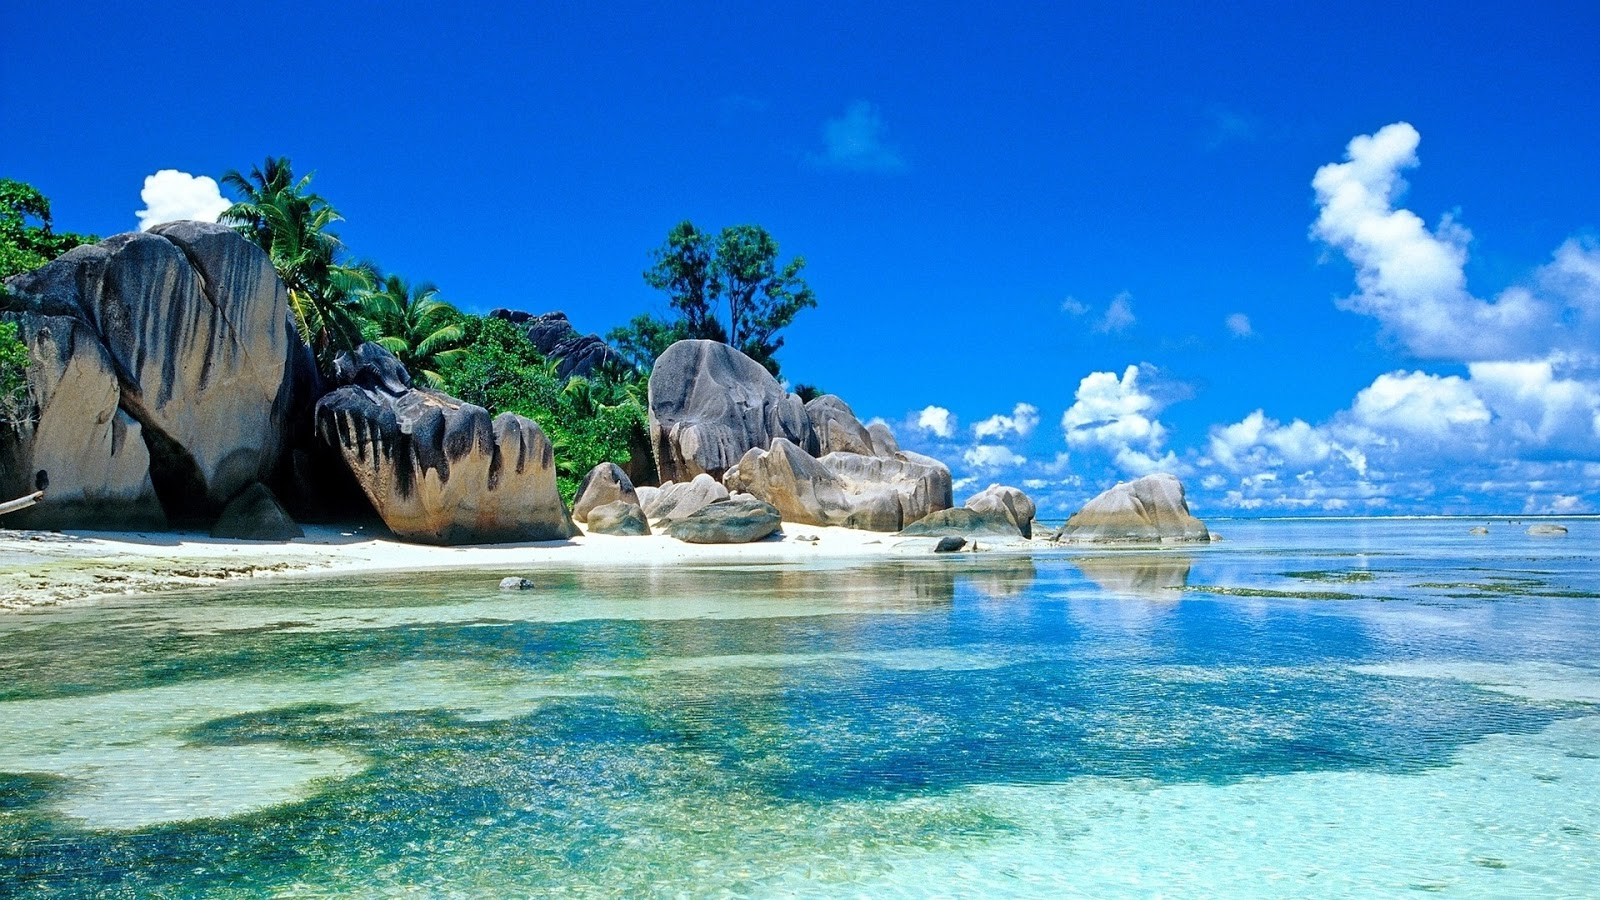 Paradise Island Full HD Desktop Wallpapers 1080p 1600x900